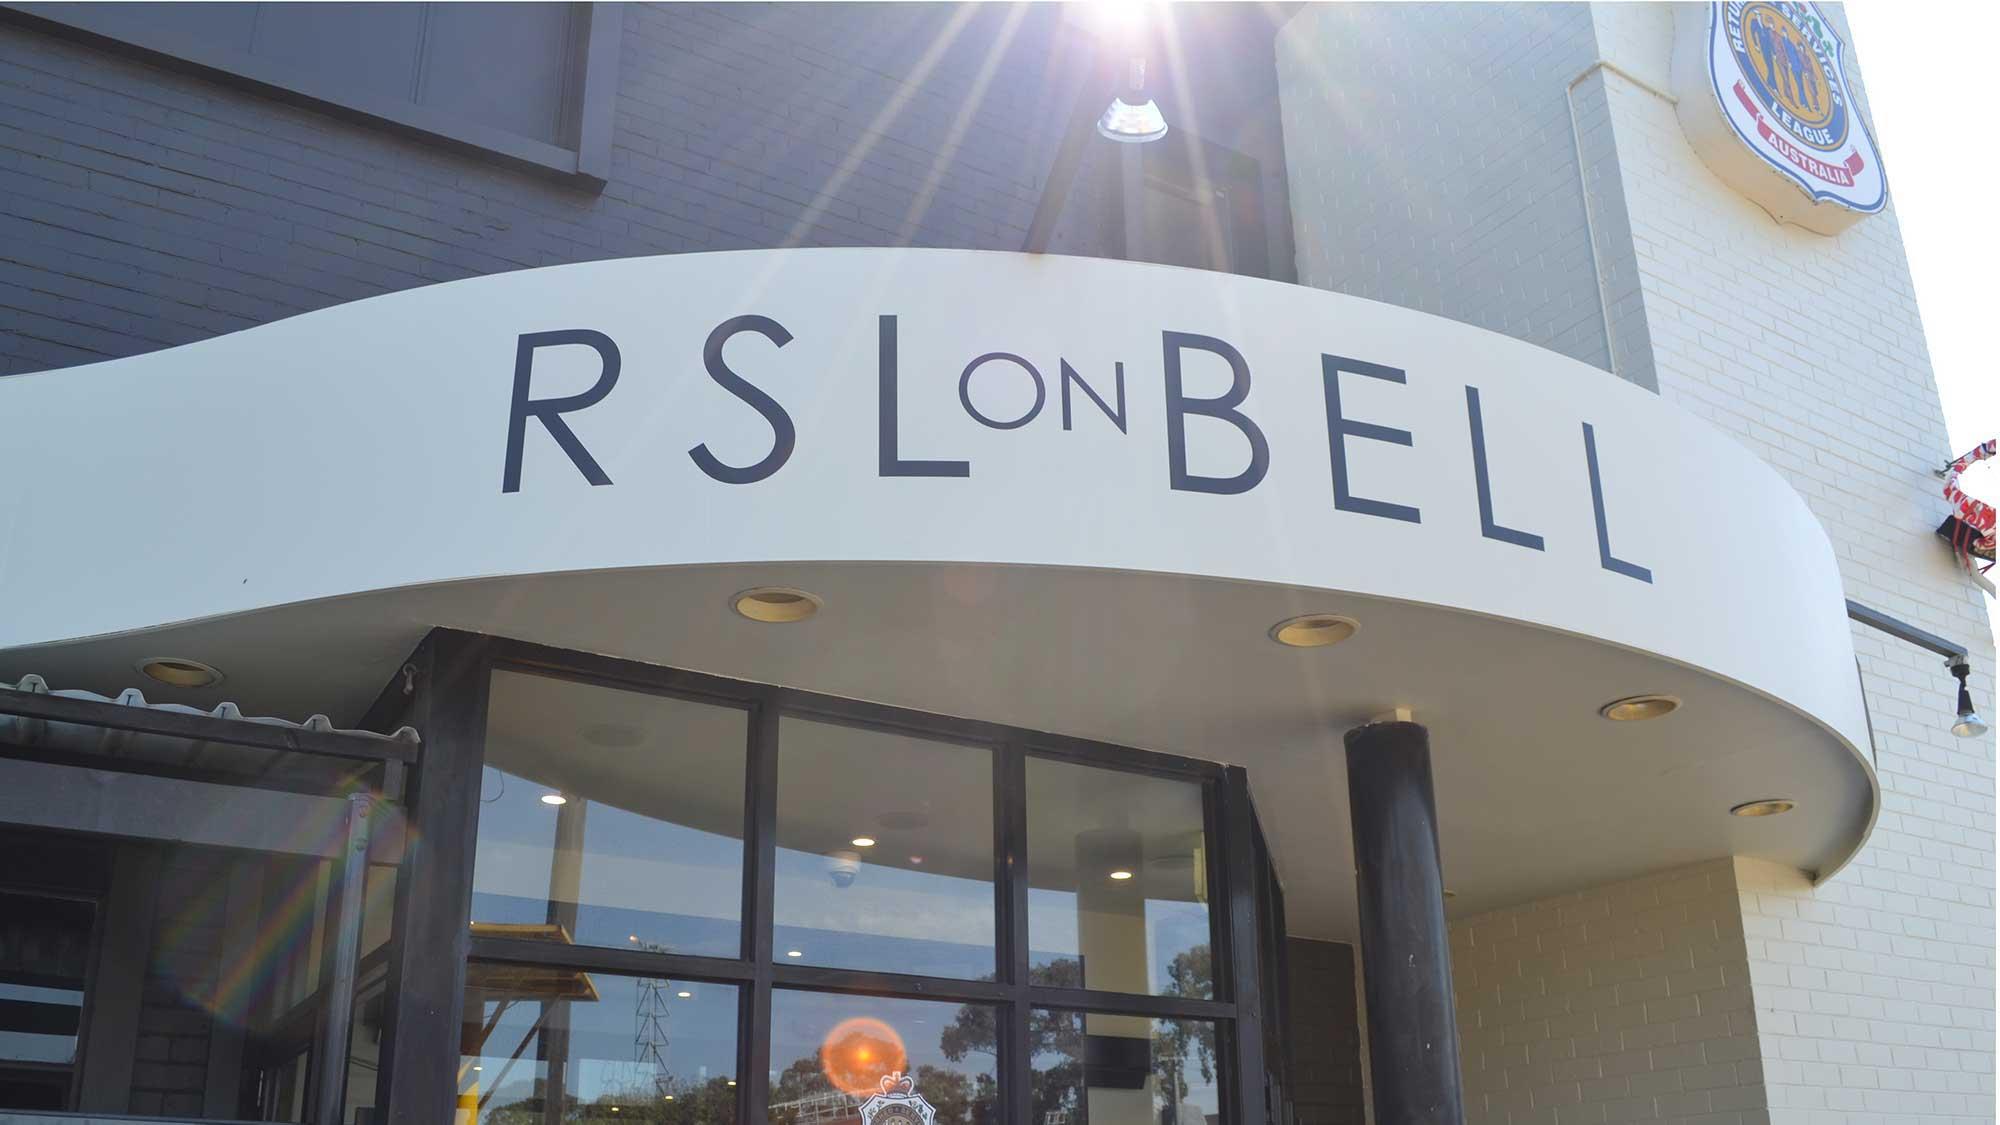 RSL on Bell